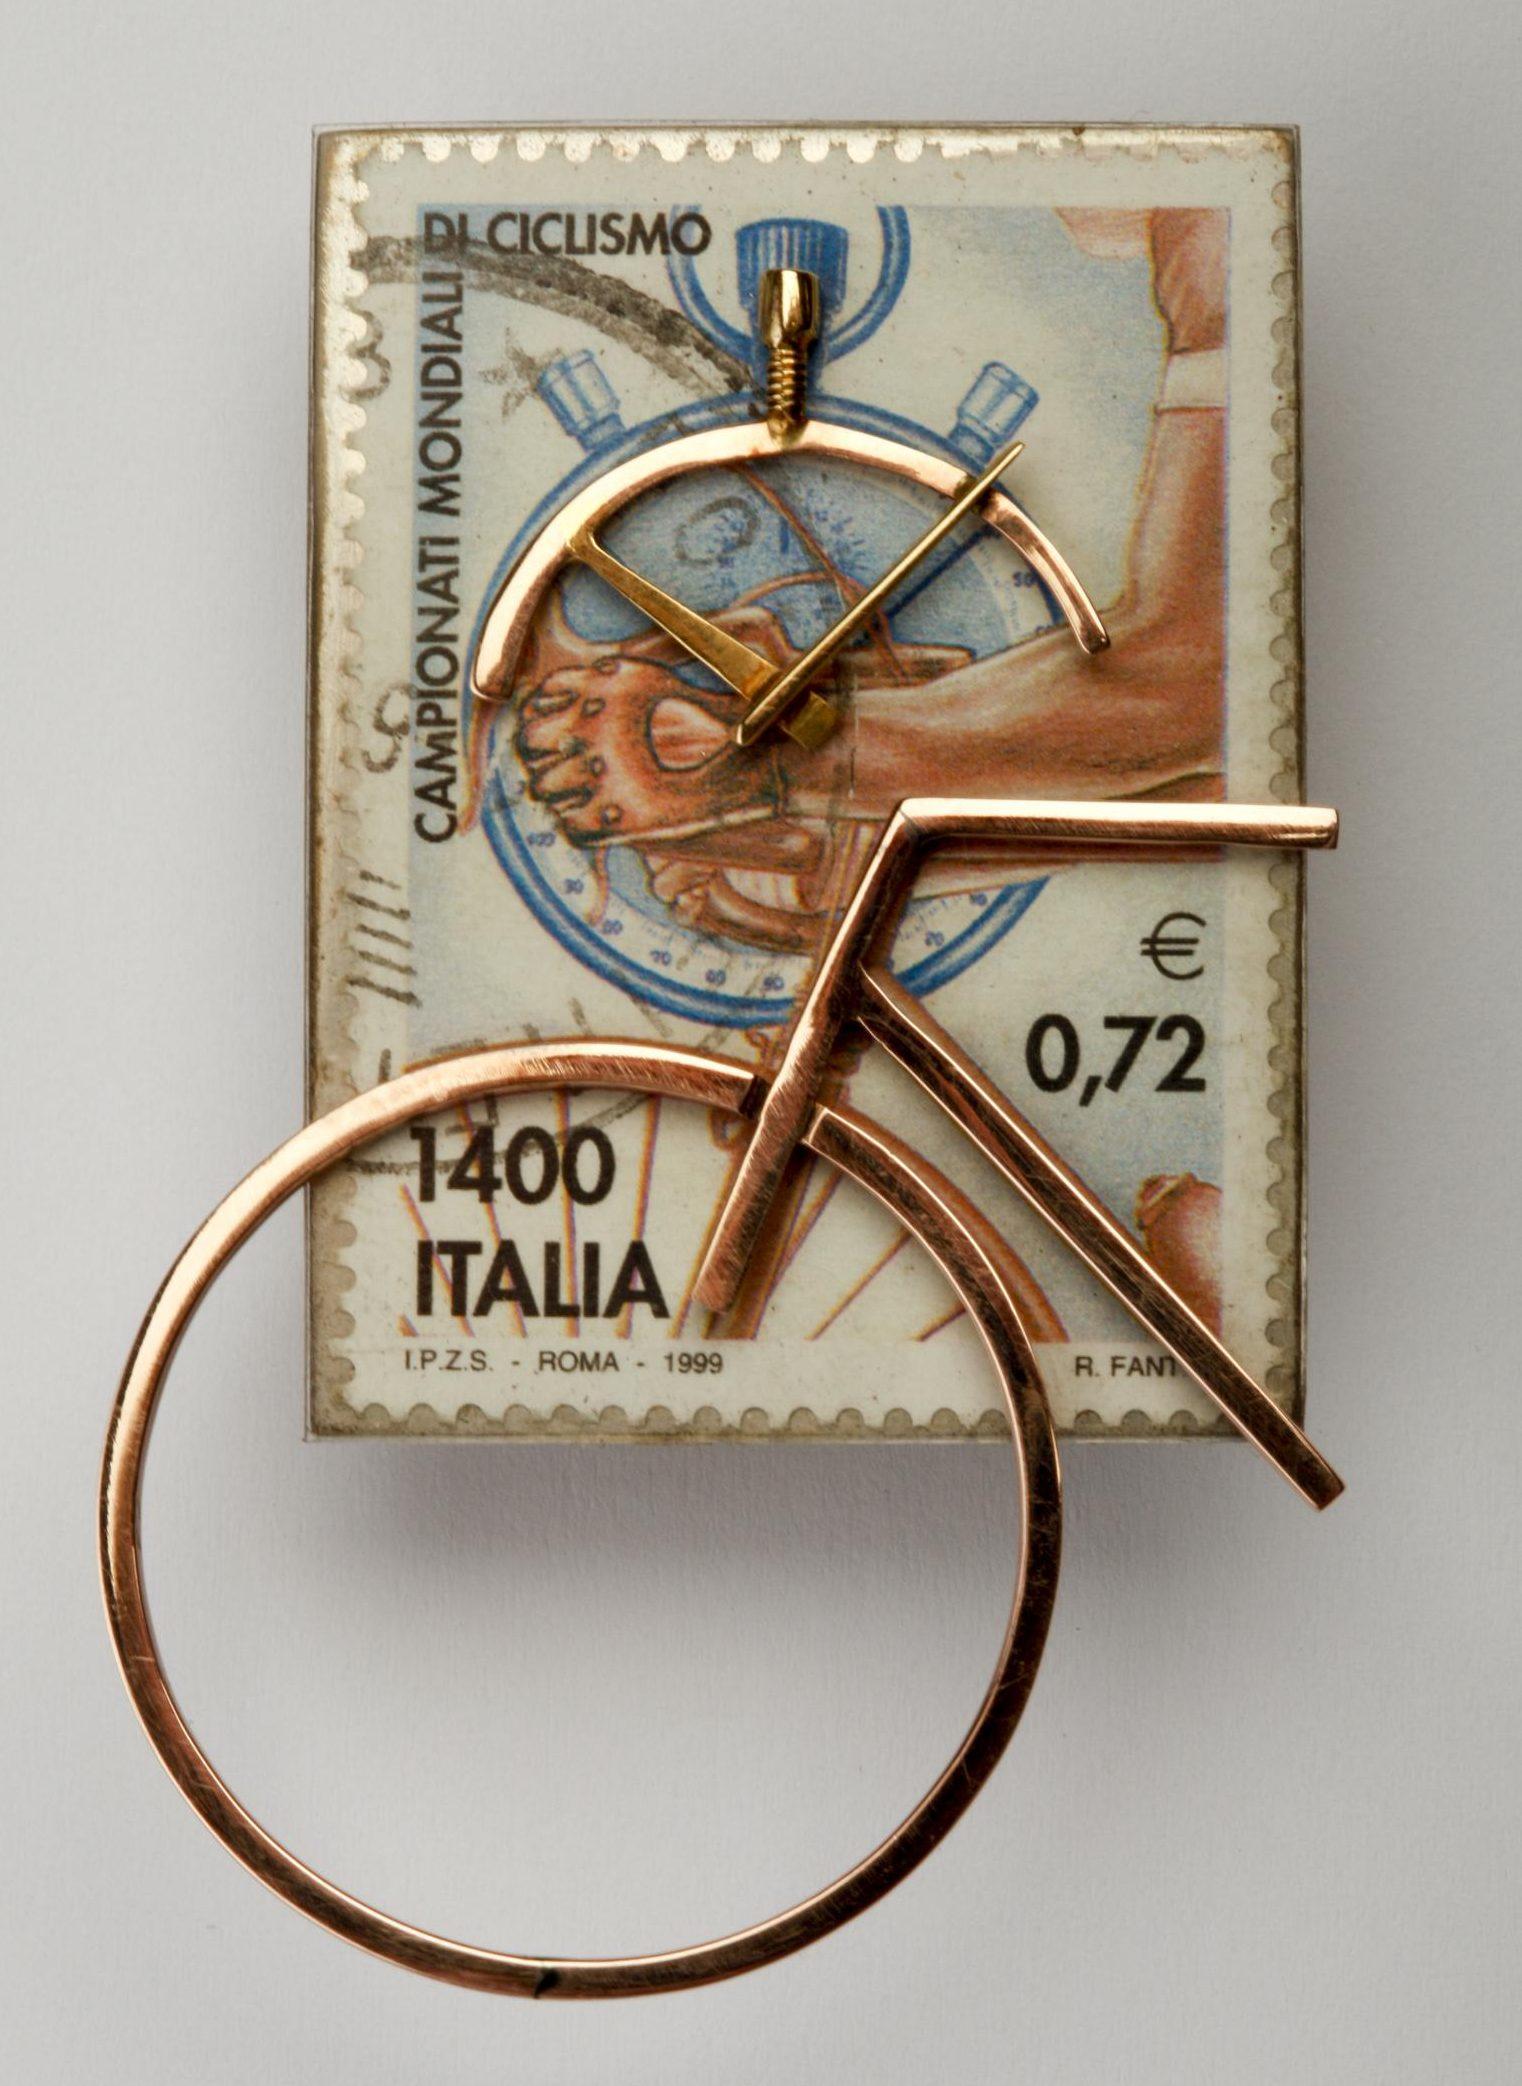 Karel Betman, Going Dutch, broche, rood goud, zilver, postzegel, gegomd papier, drukwerk